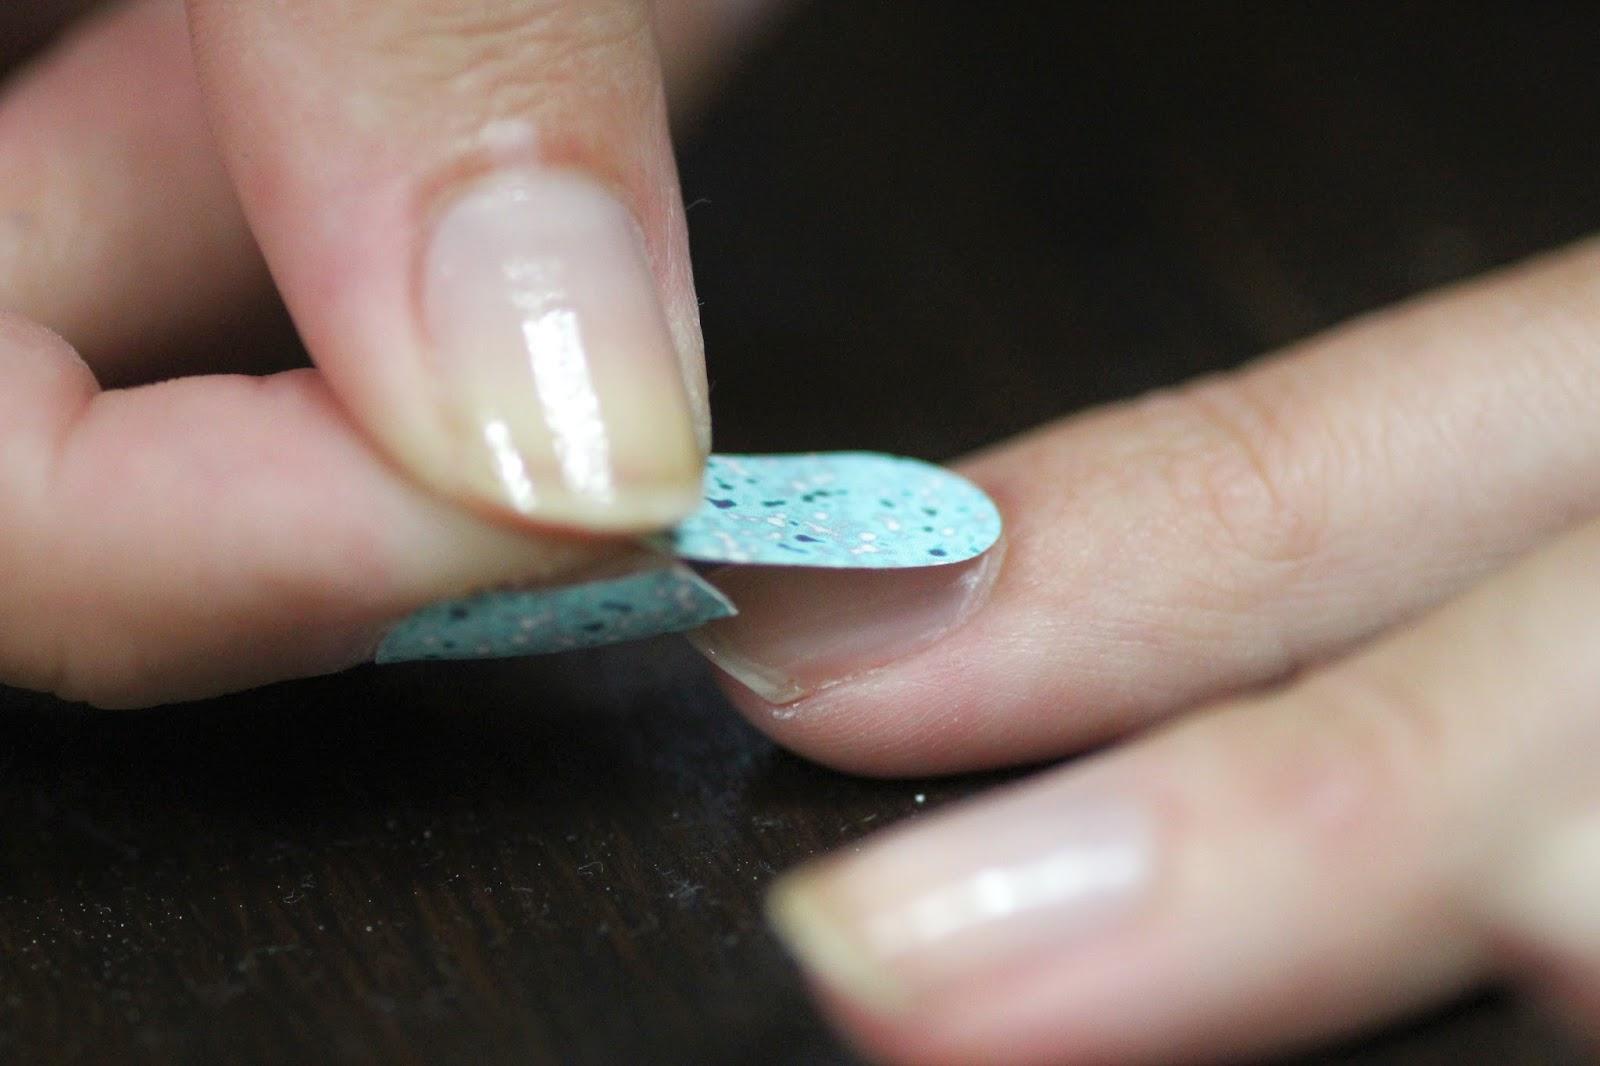 BEAUTY: NAIL WRAPS BY GLAMSTRIPES PRIZMAHFASHION